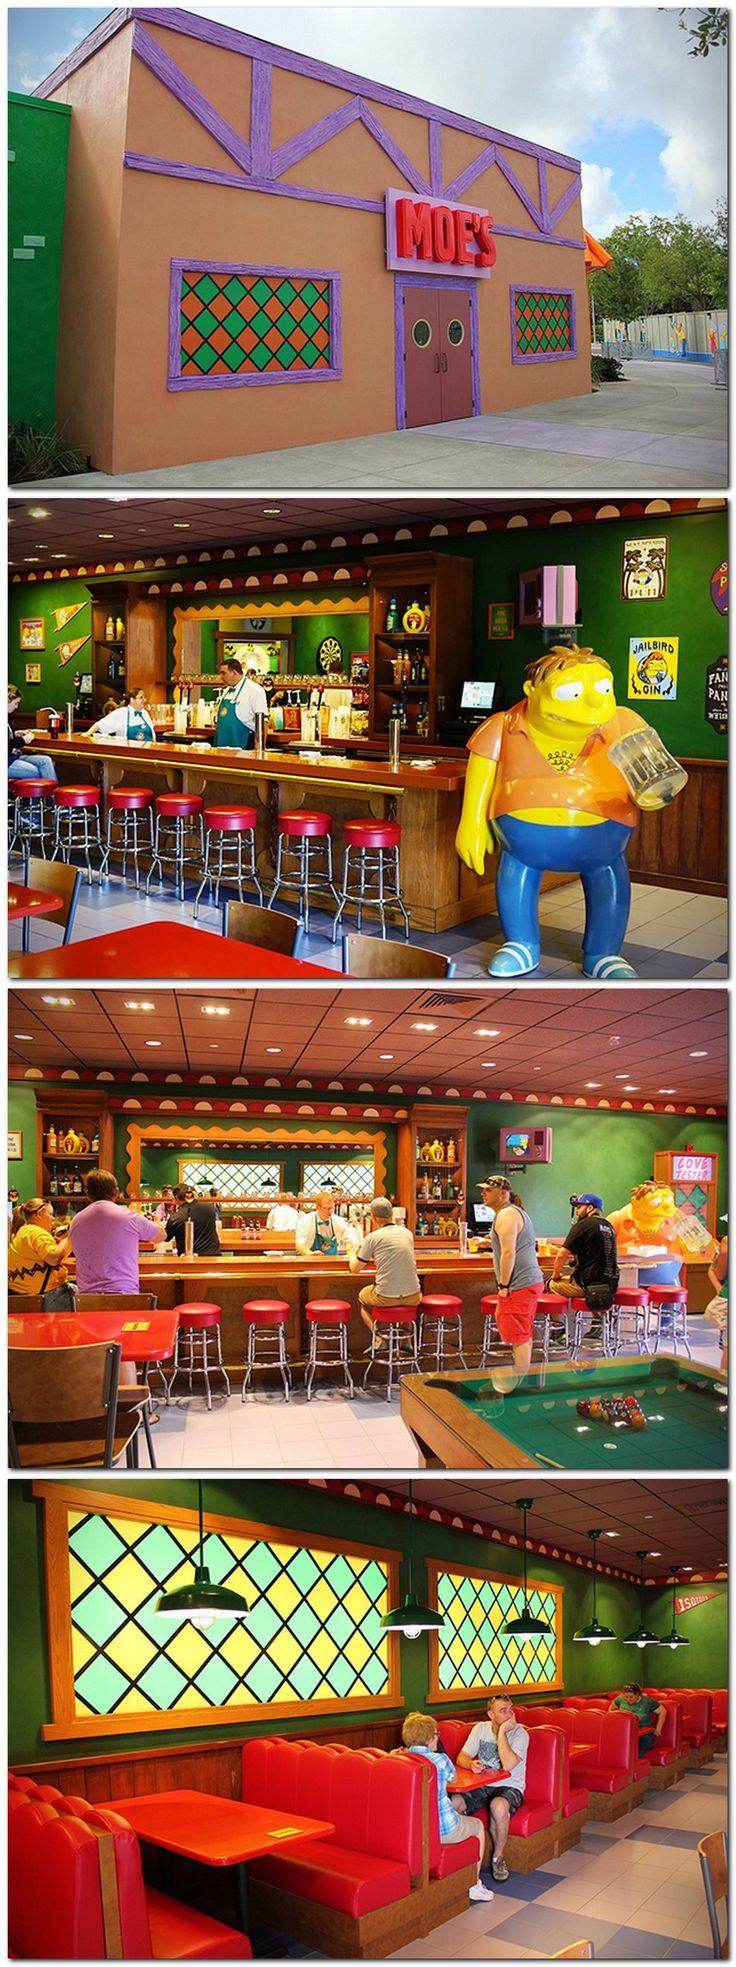 #THESIMPSONS : Moe's Tavern At Universal Studios Florida.